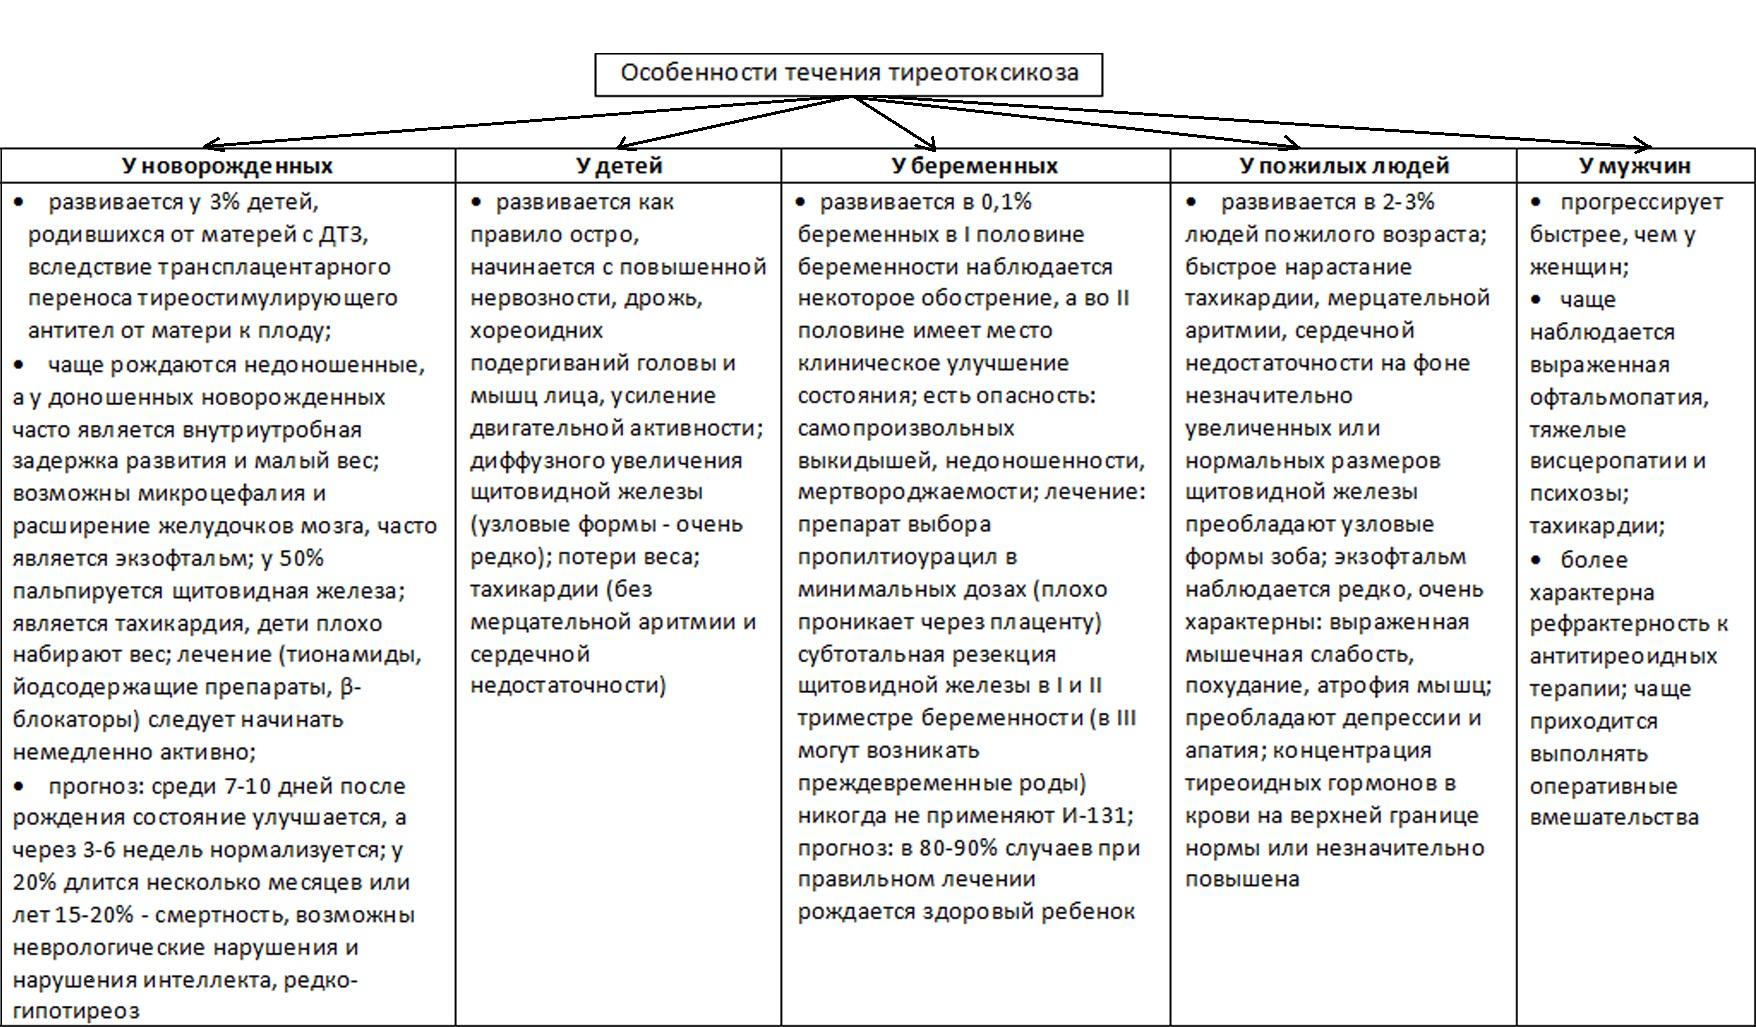 Особености течения тиреотоксикоза